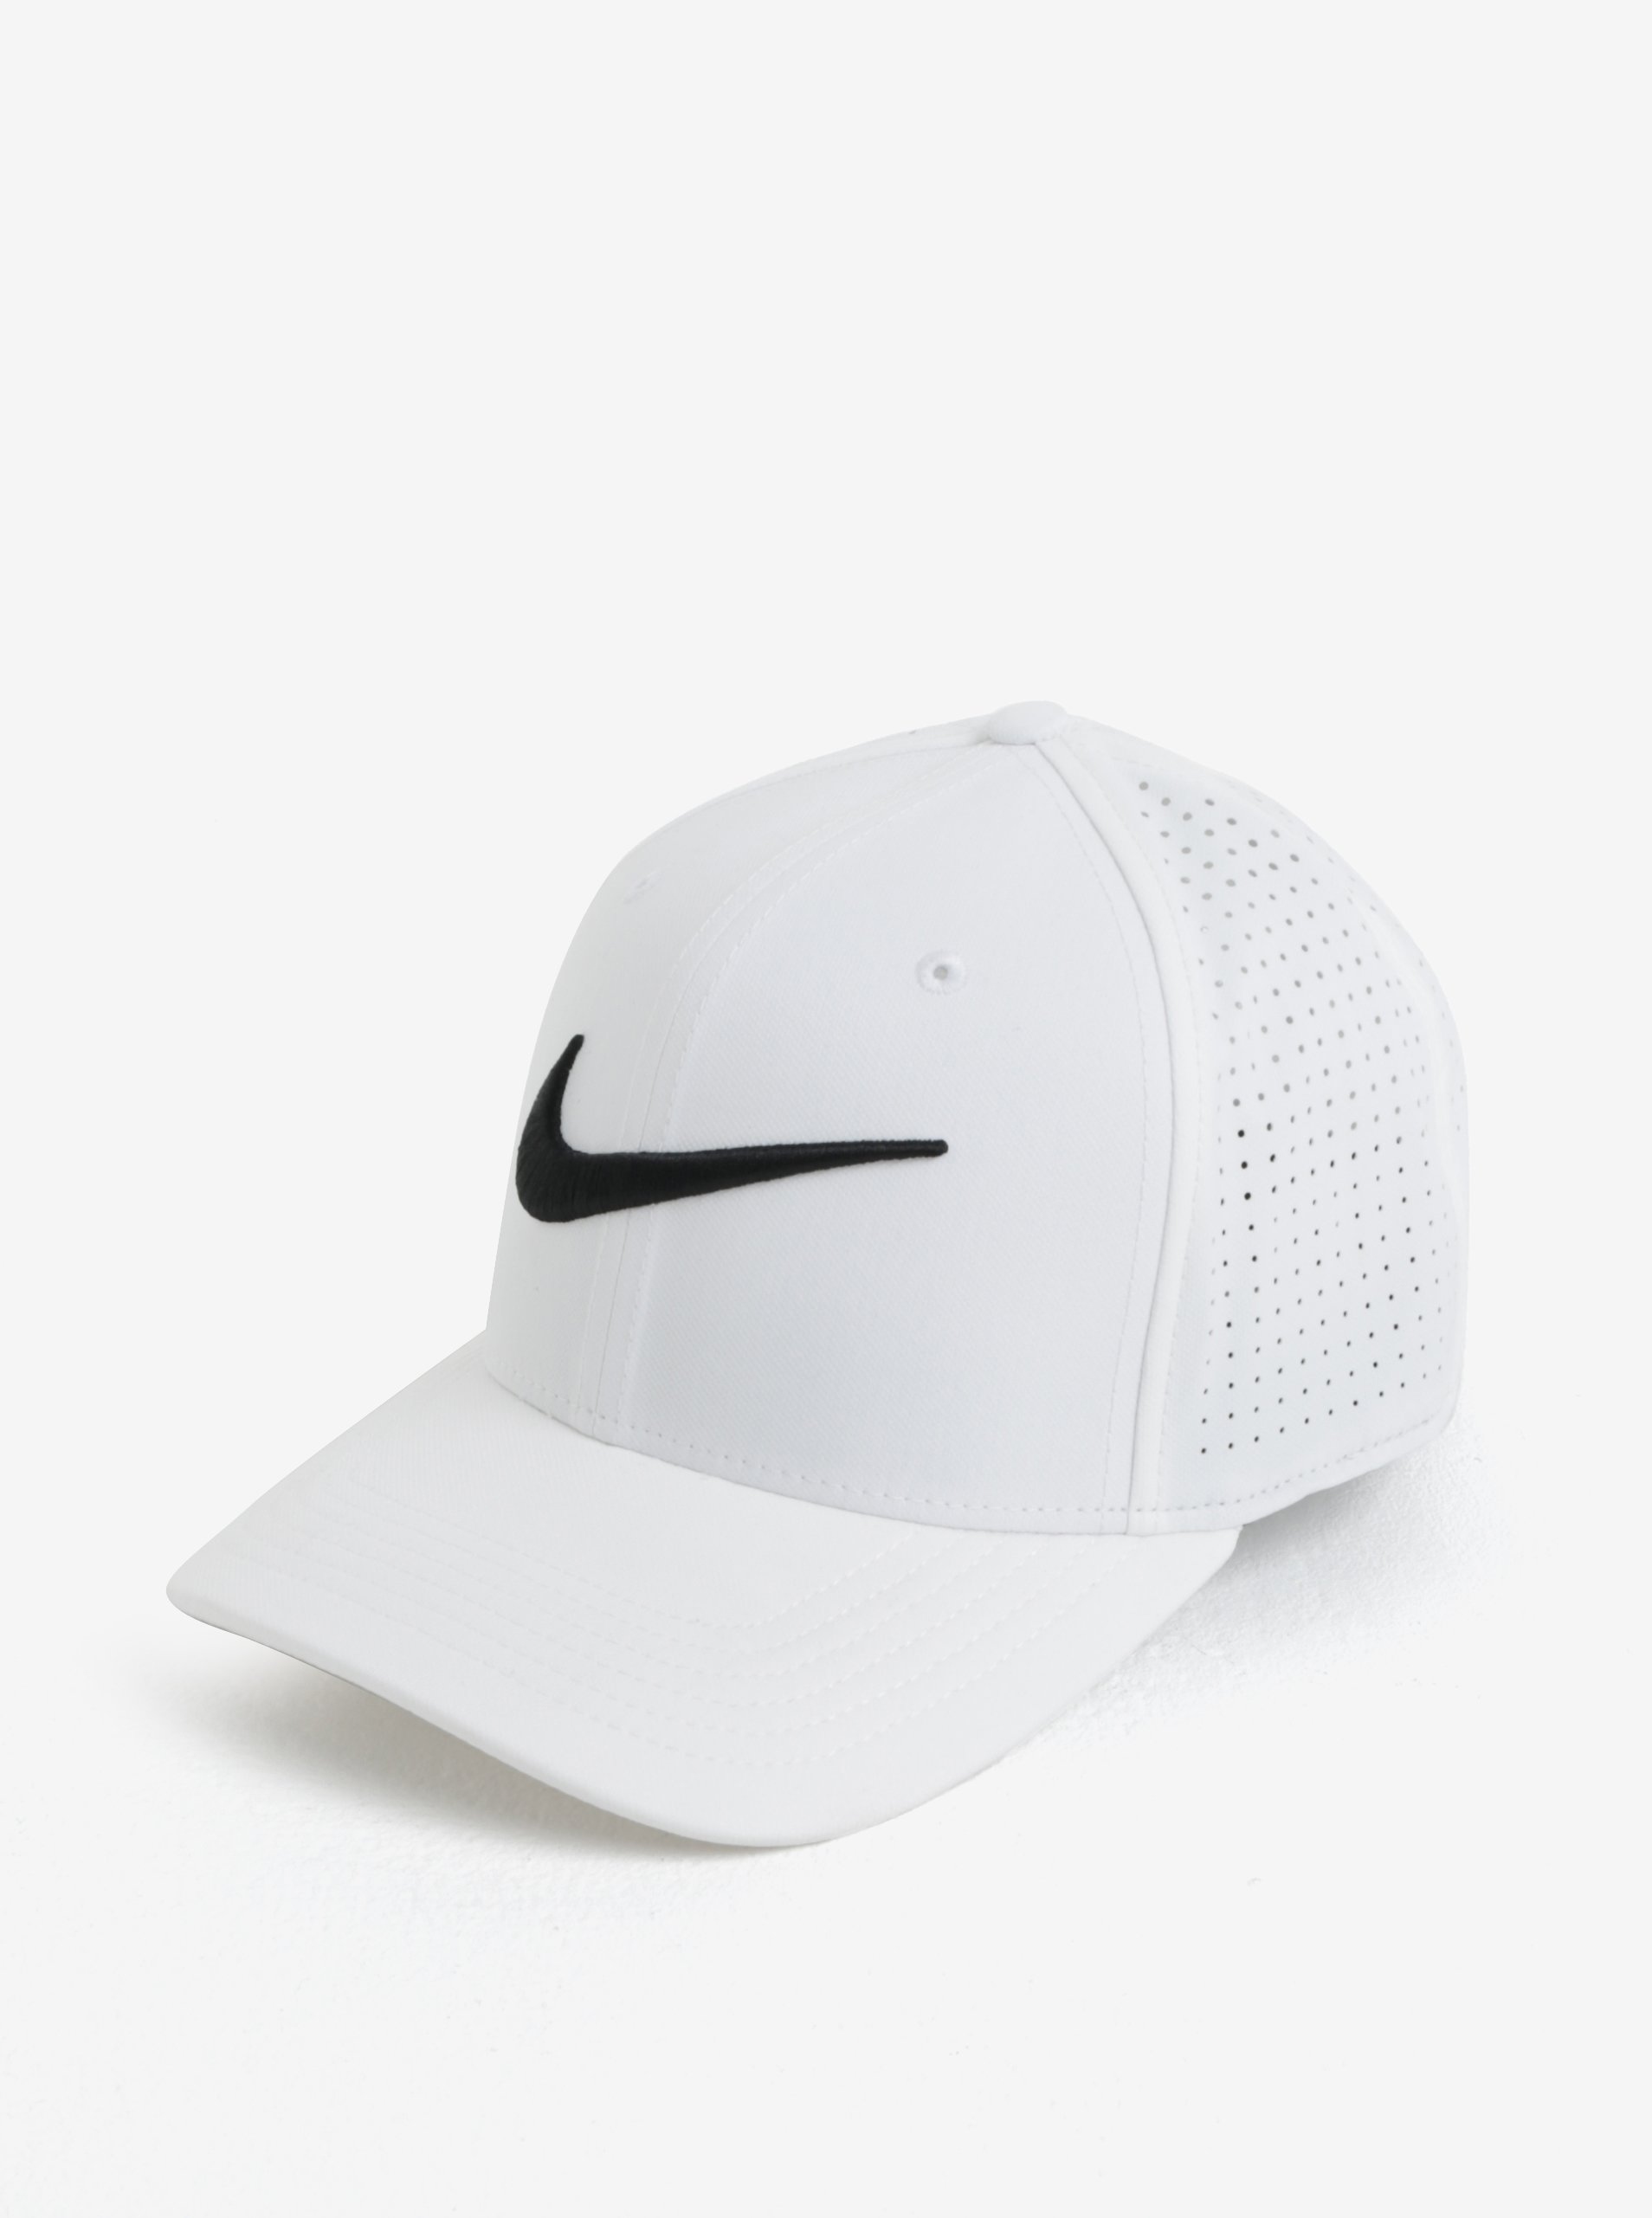 d7fc32cf1 Biela unisex funkčná šiltovka Nike